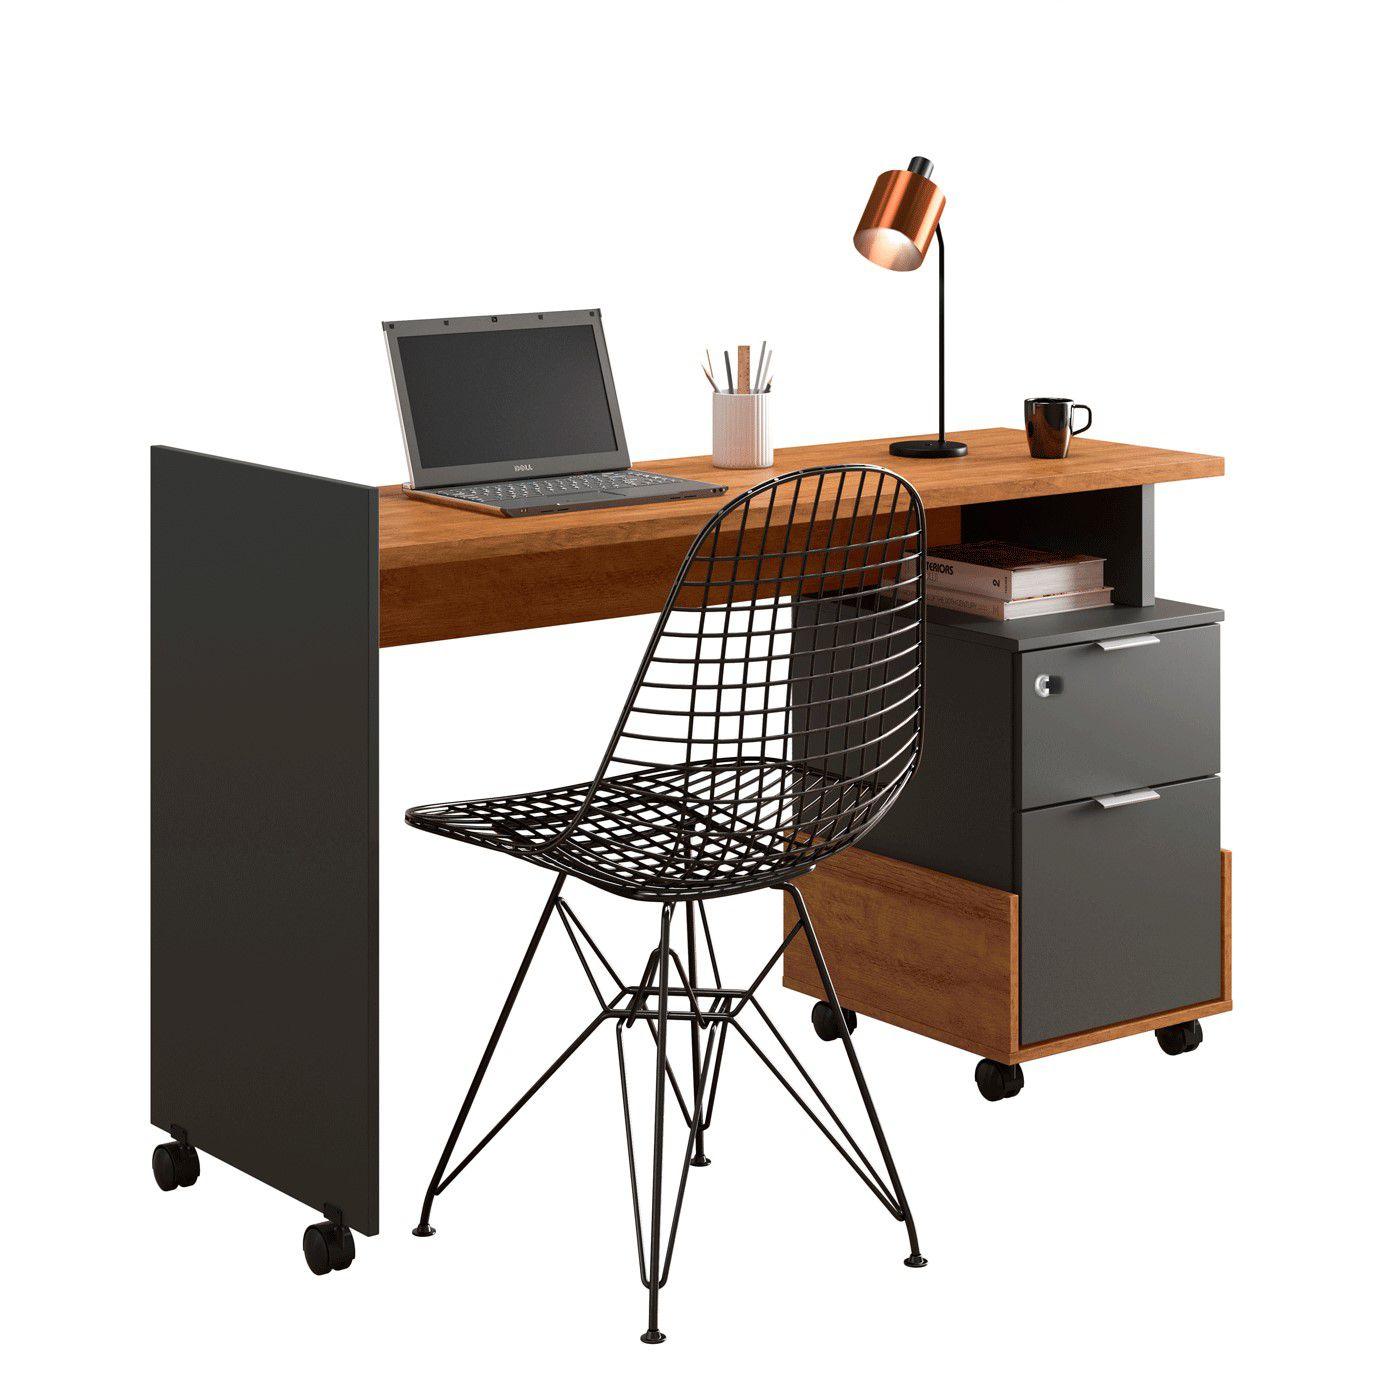 Office Alessa M1 Amêndoa / Chumbo